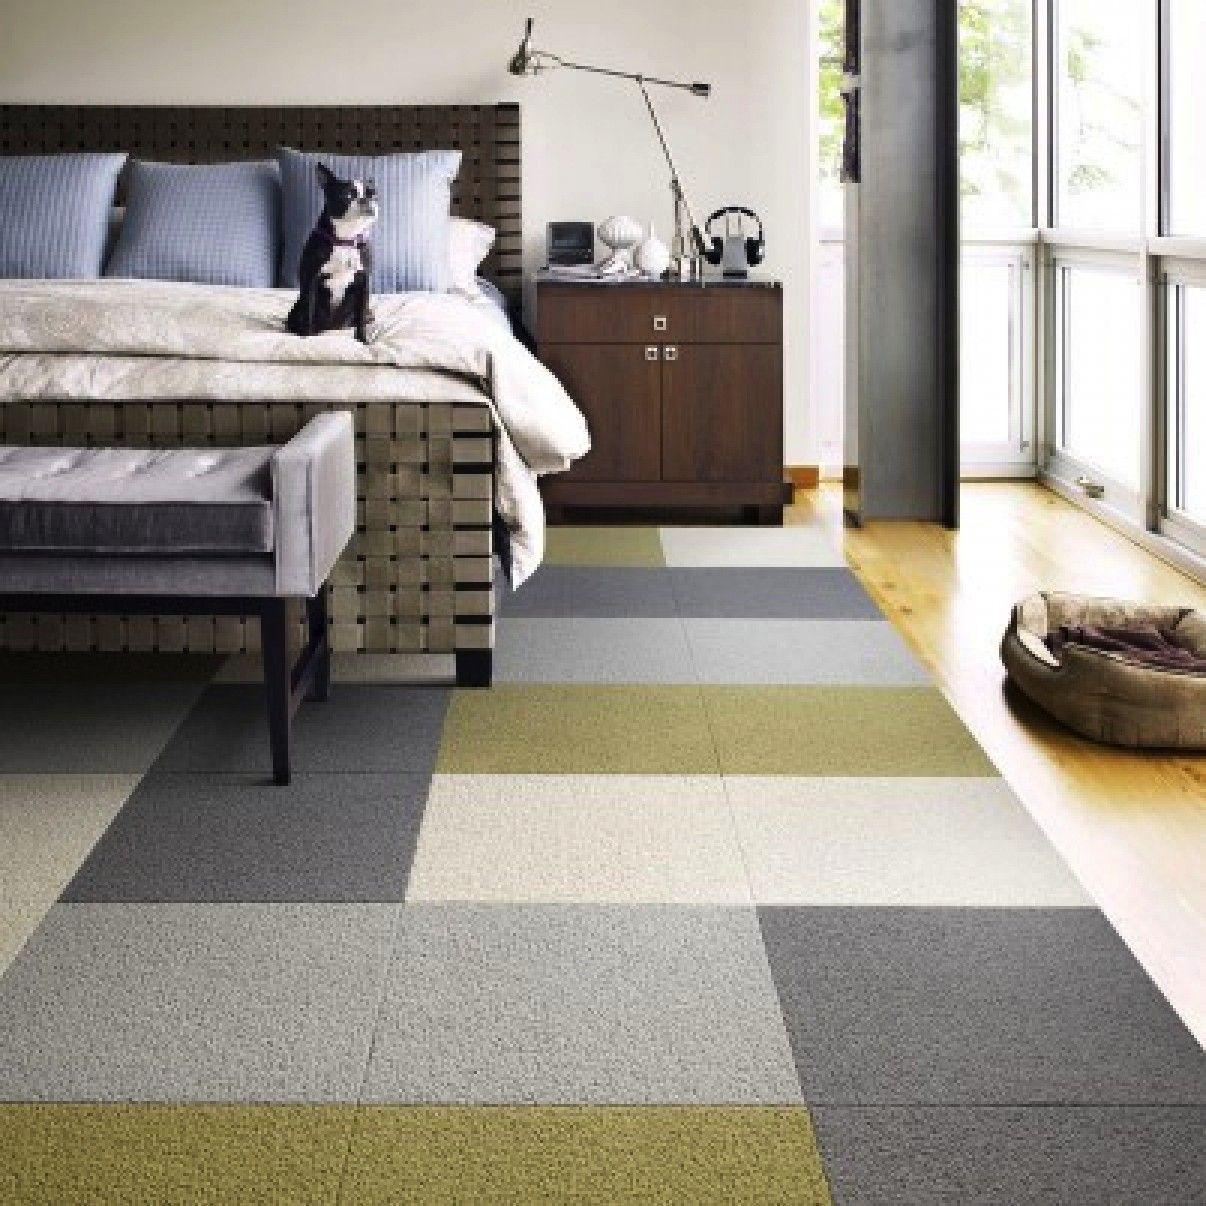 Bedroom Carpet Tiles Design